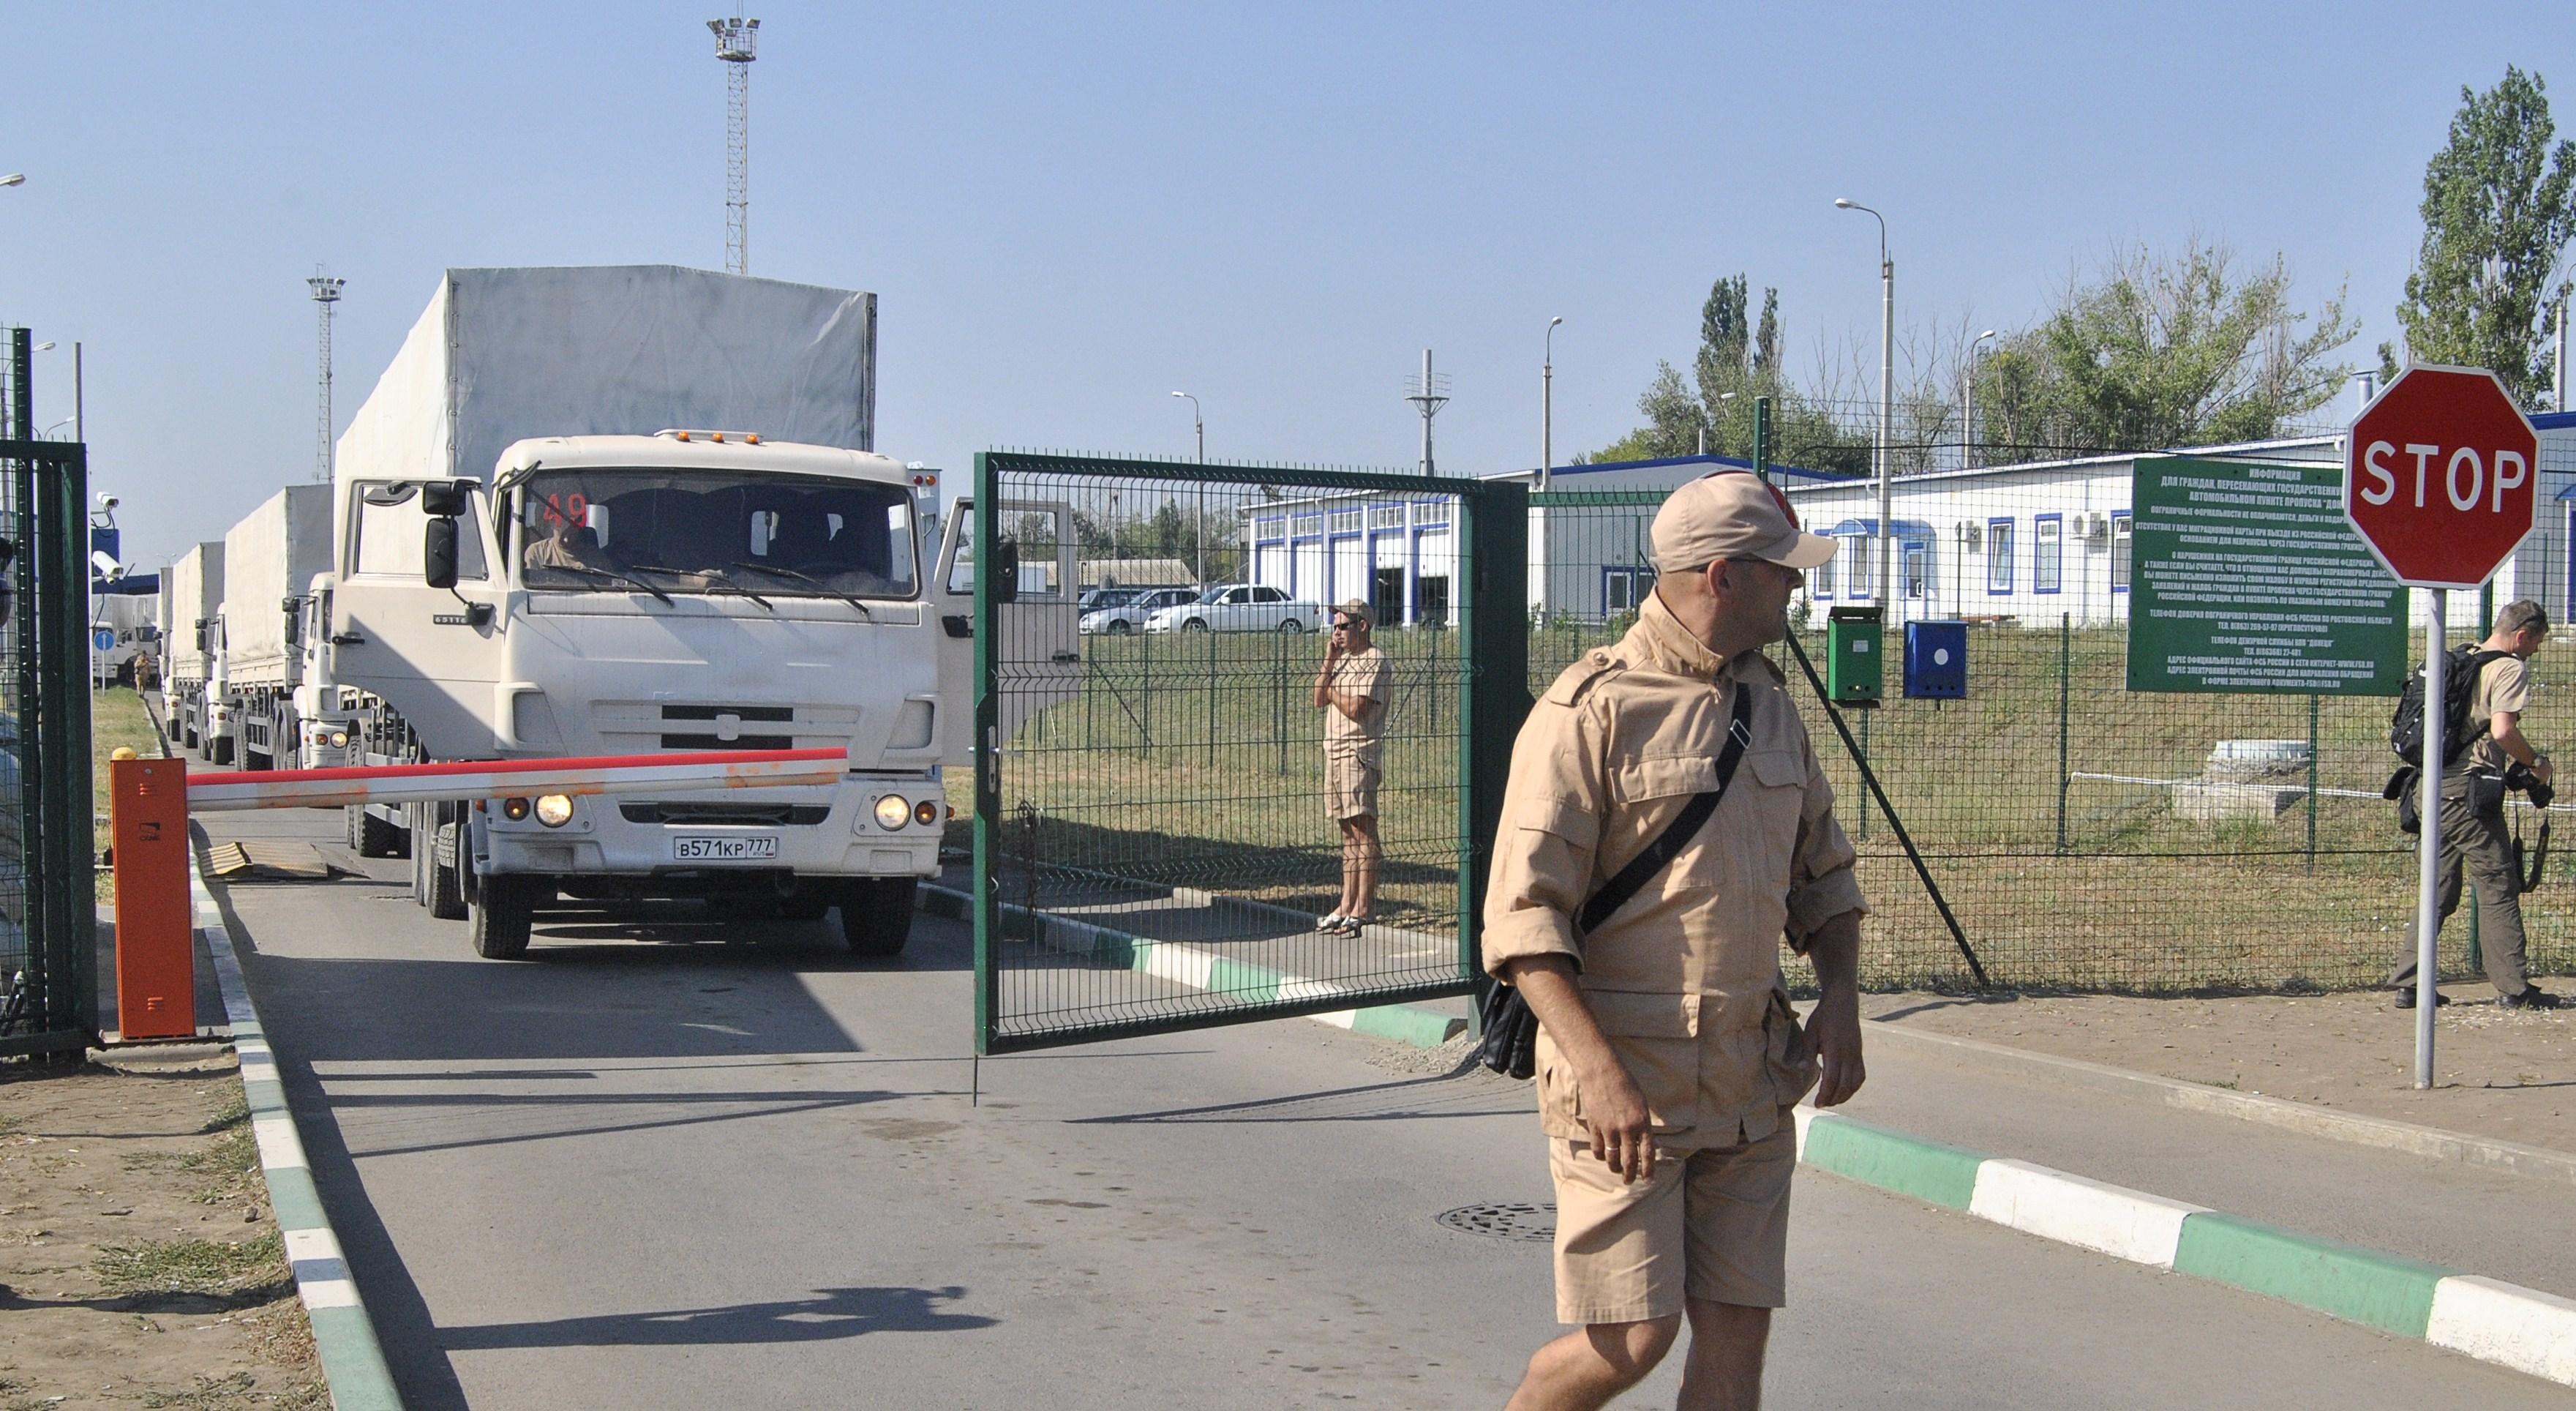 Putin's government in Ukraine's Donbas